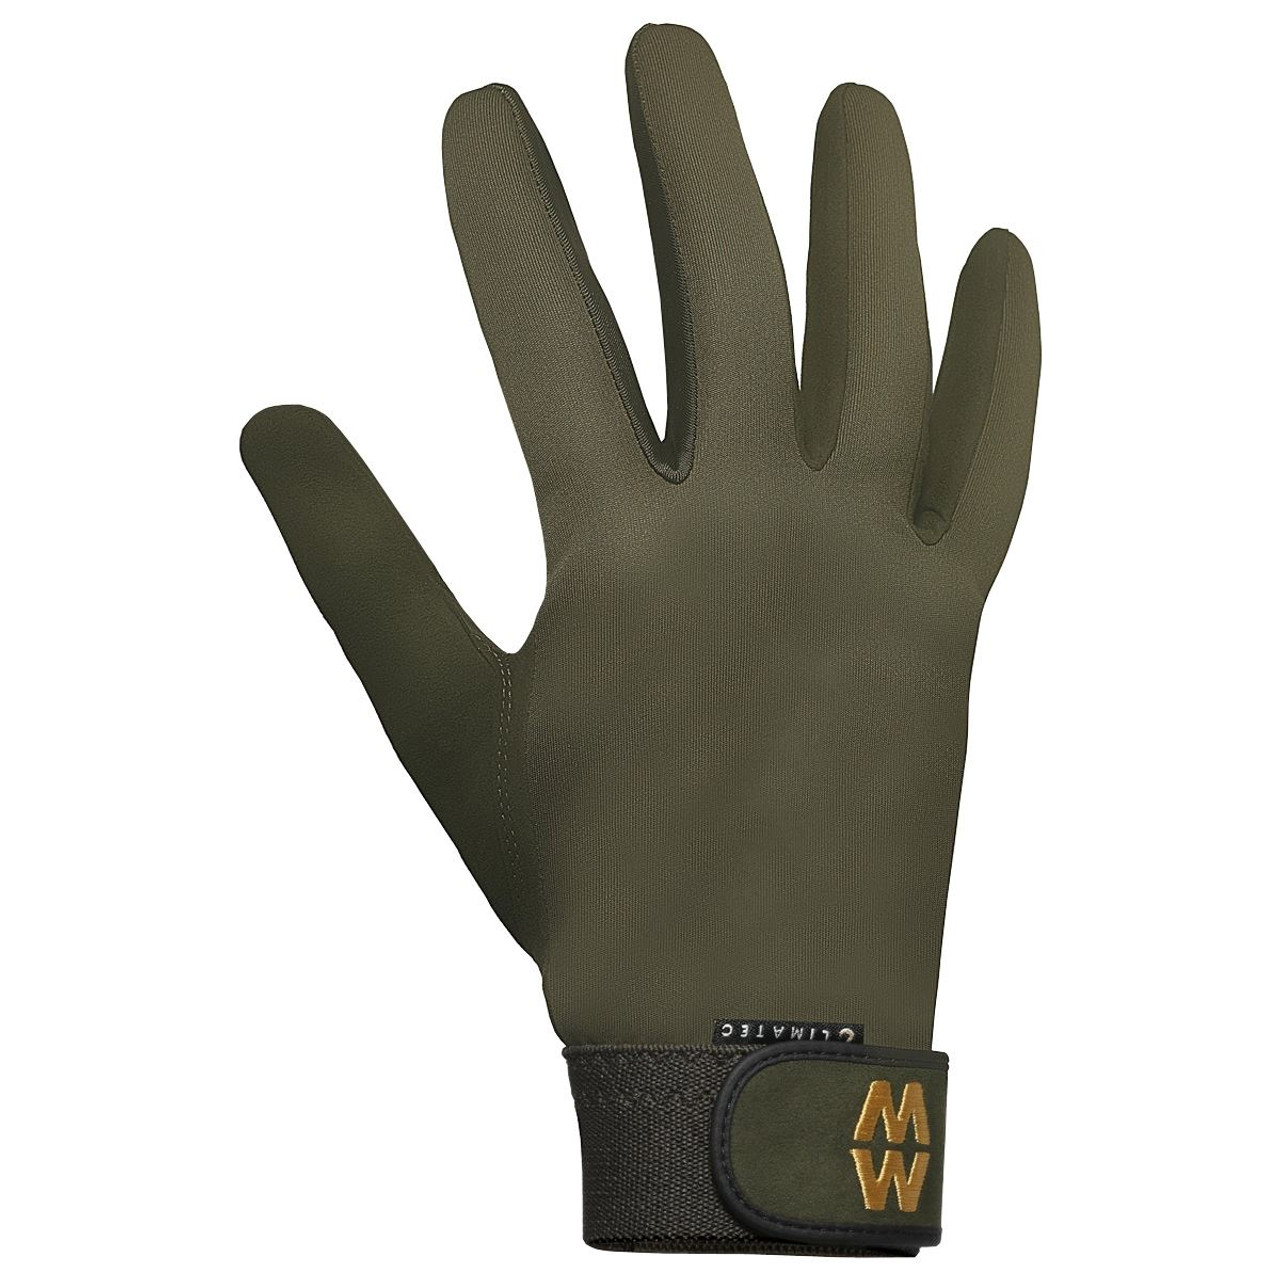 MacWet Climatec Long Cuff Sports Gloves